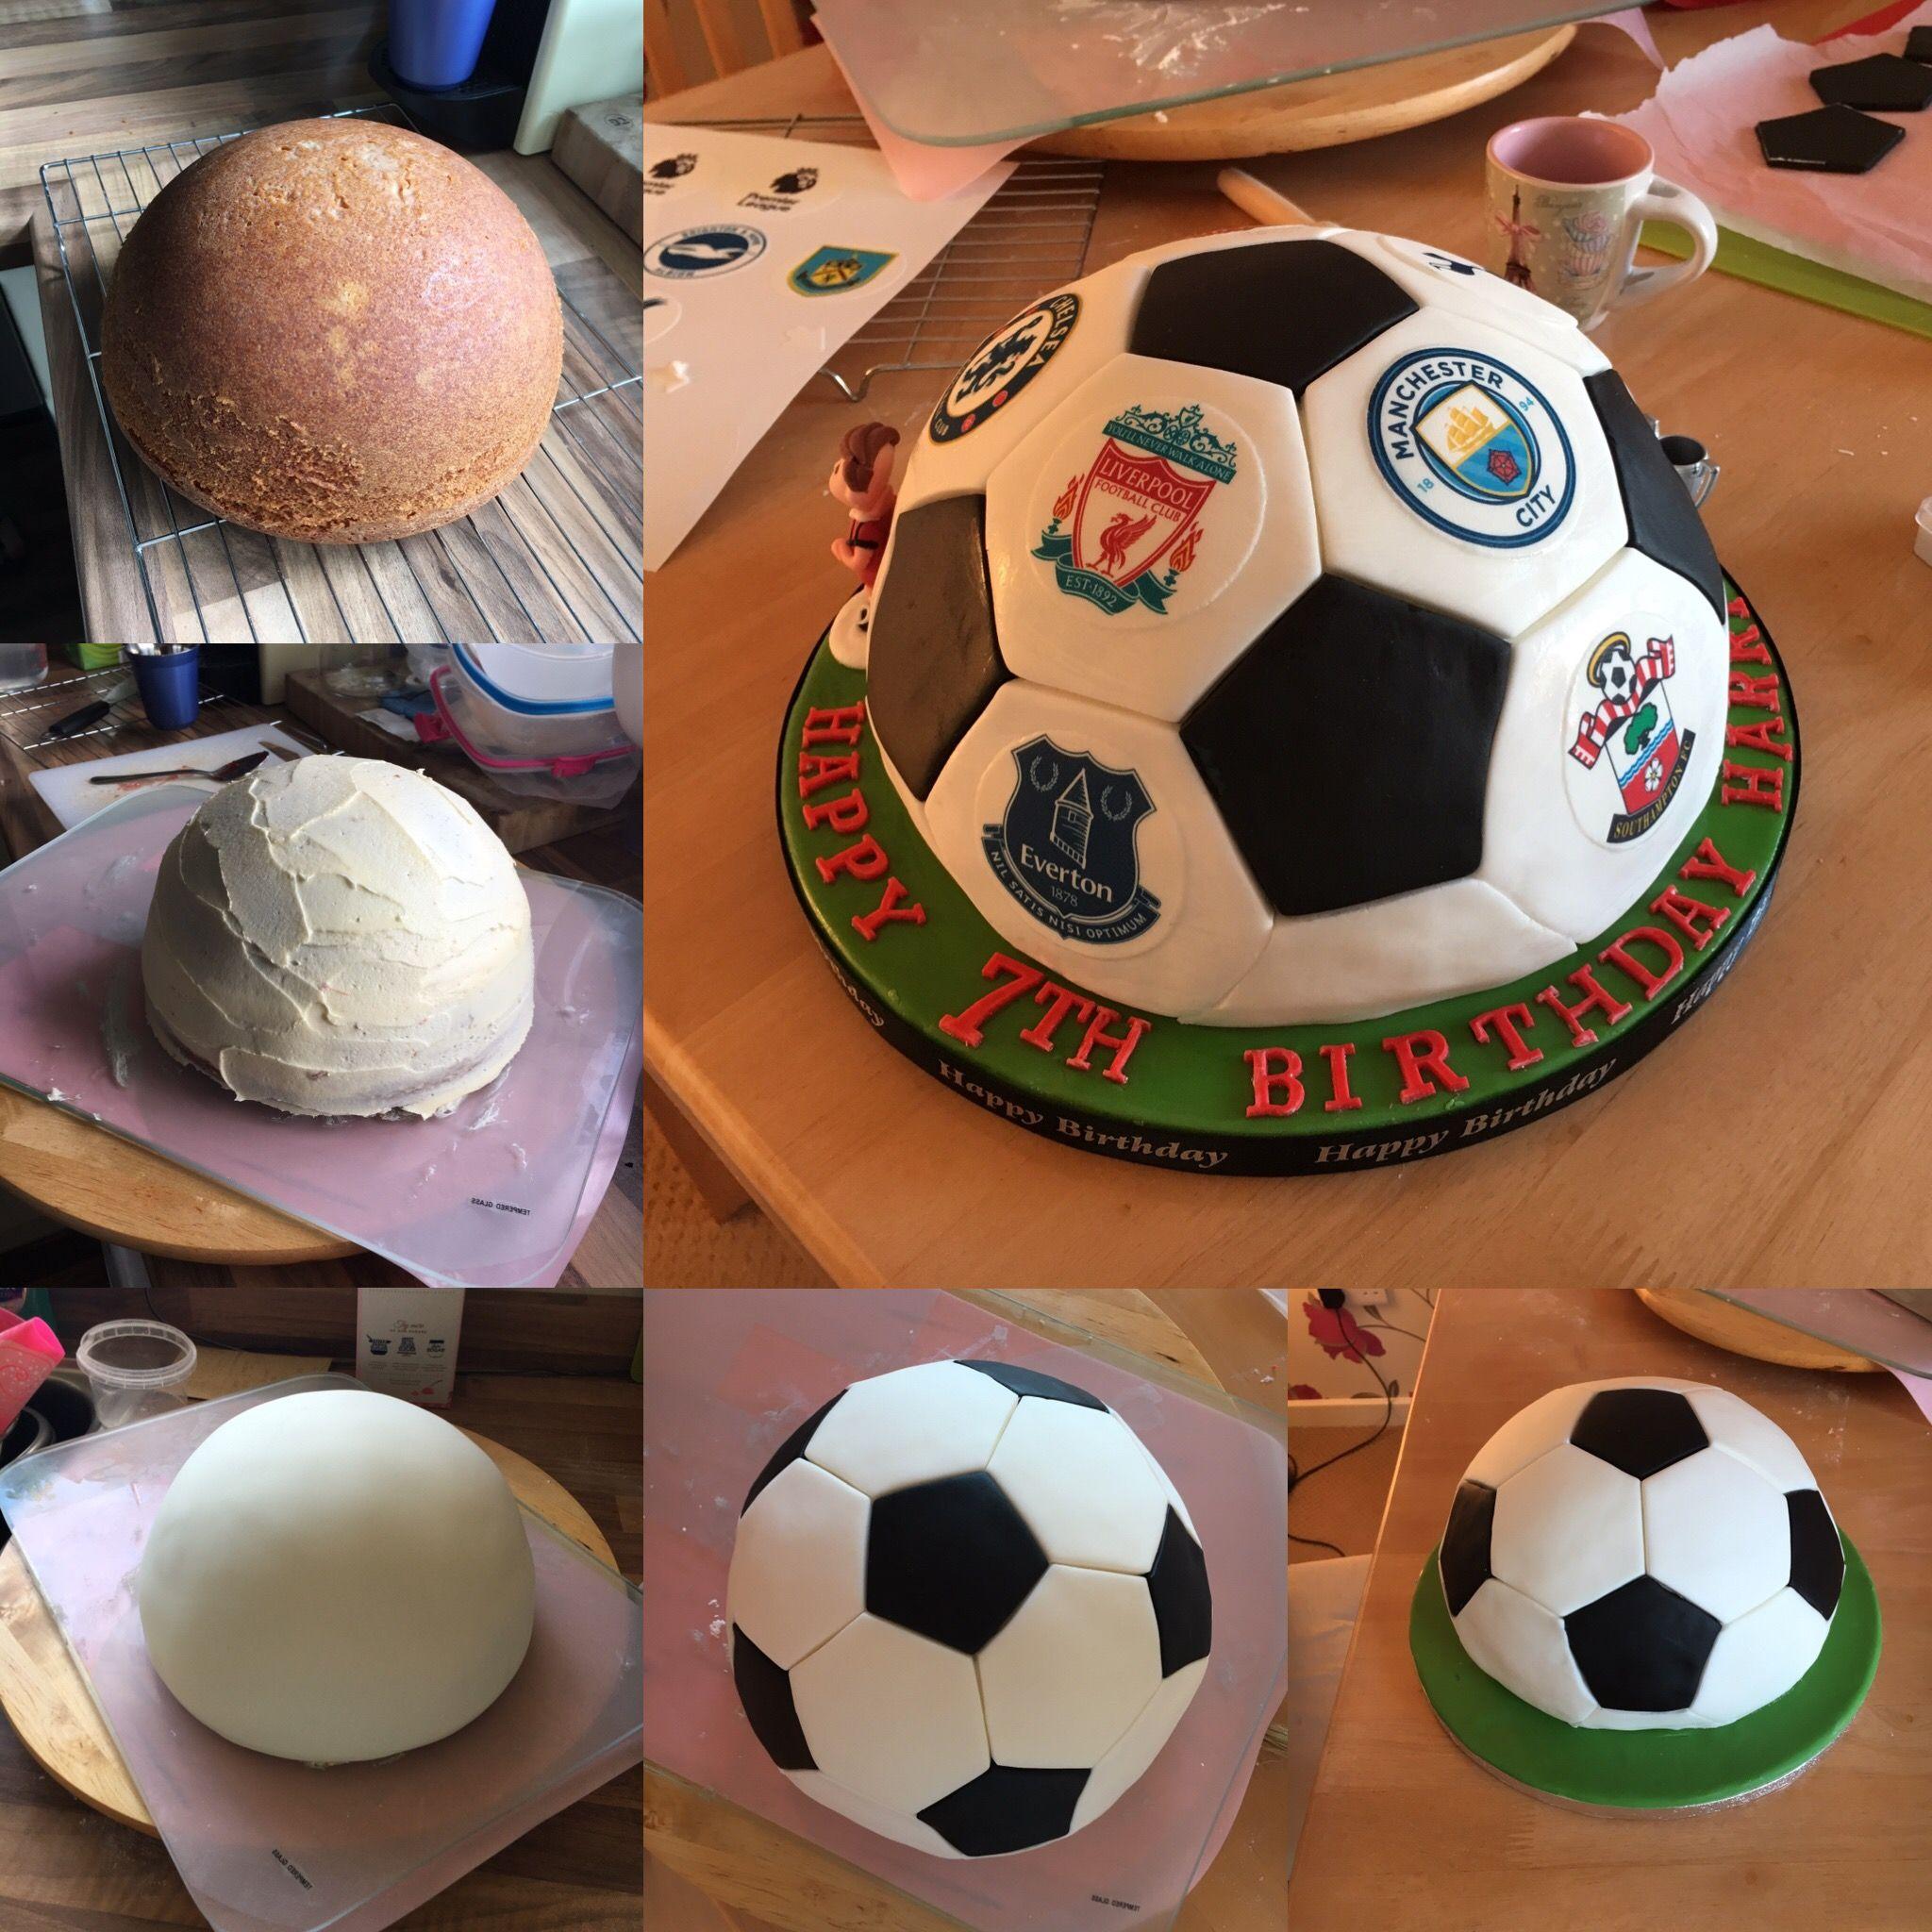 Football Soccer Ball Cake 8 5 Lakeland Dome Cake Pan Was Used Football Cake Soccer Ball Cake Soccer Cake